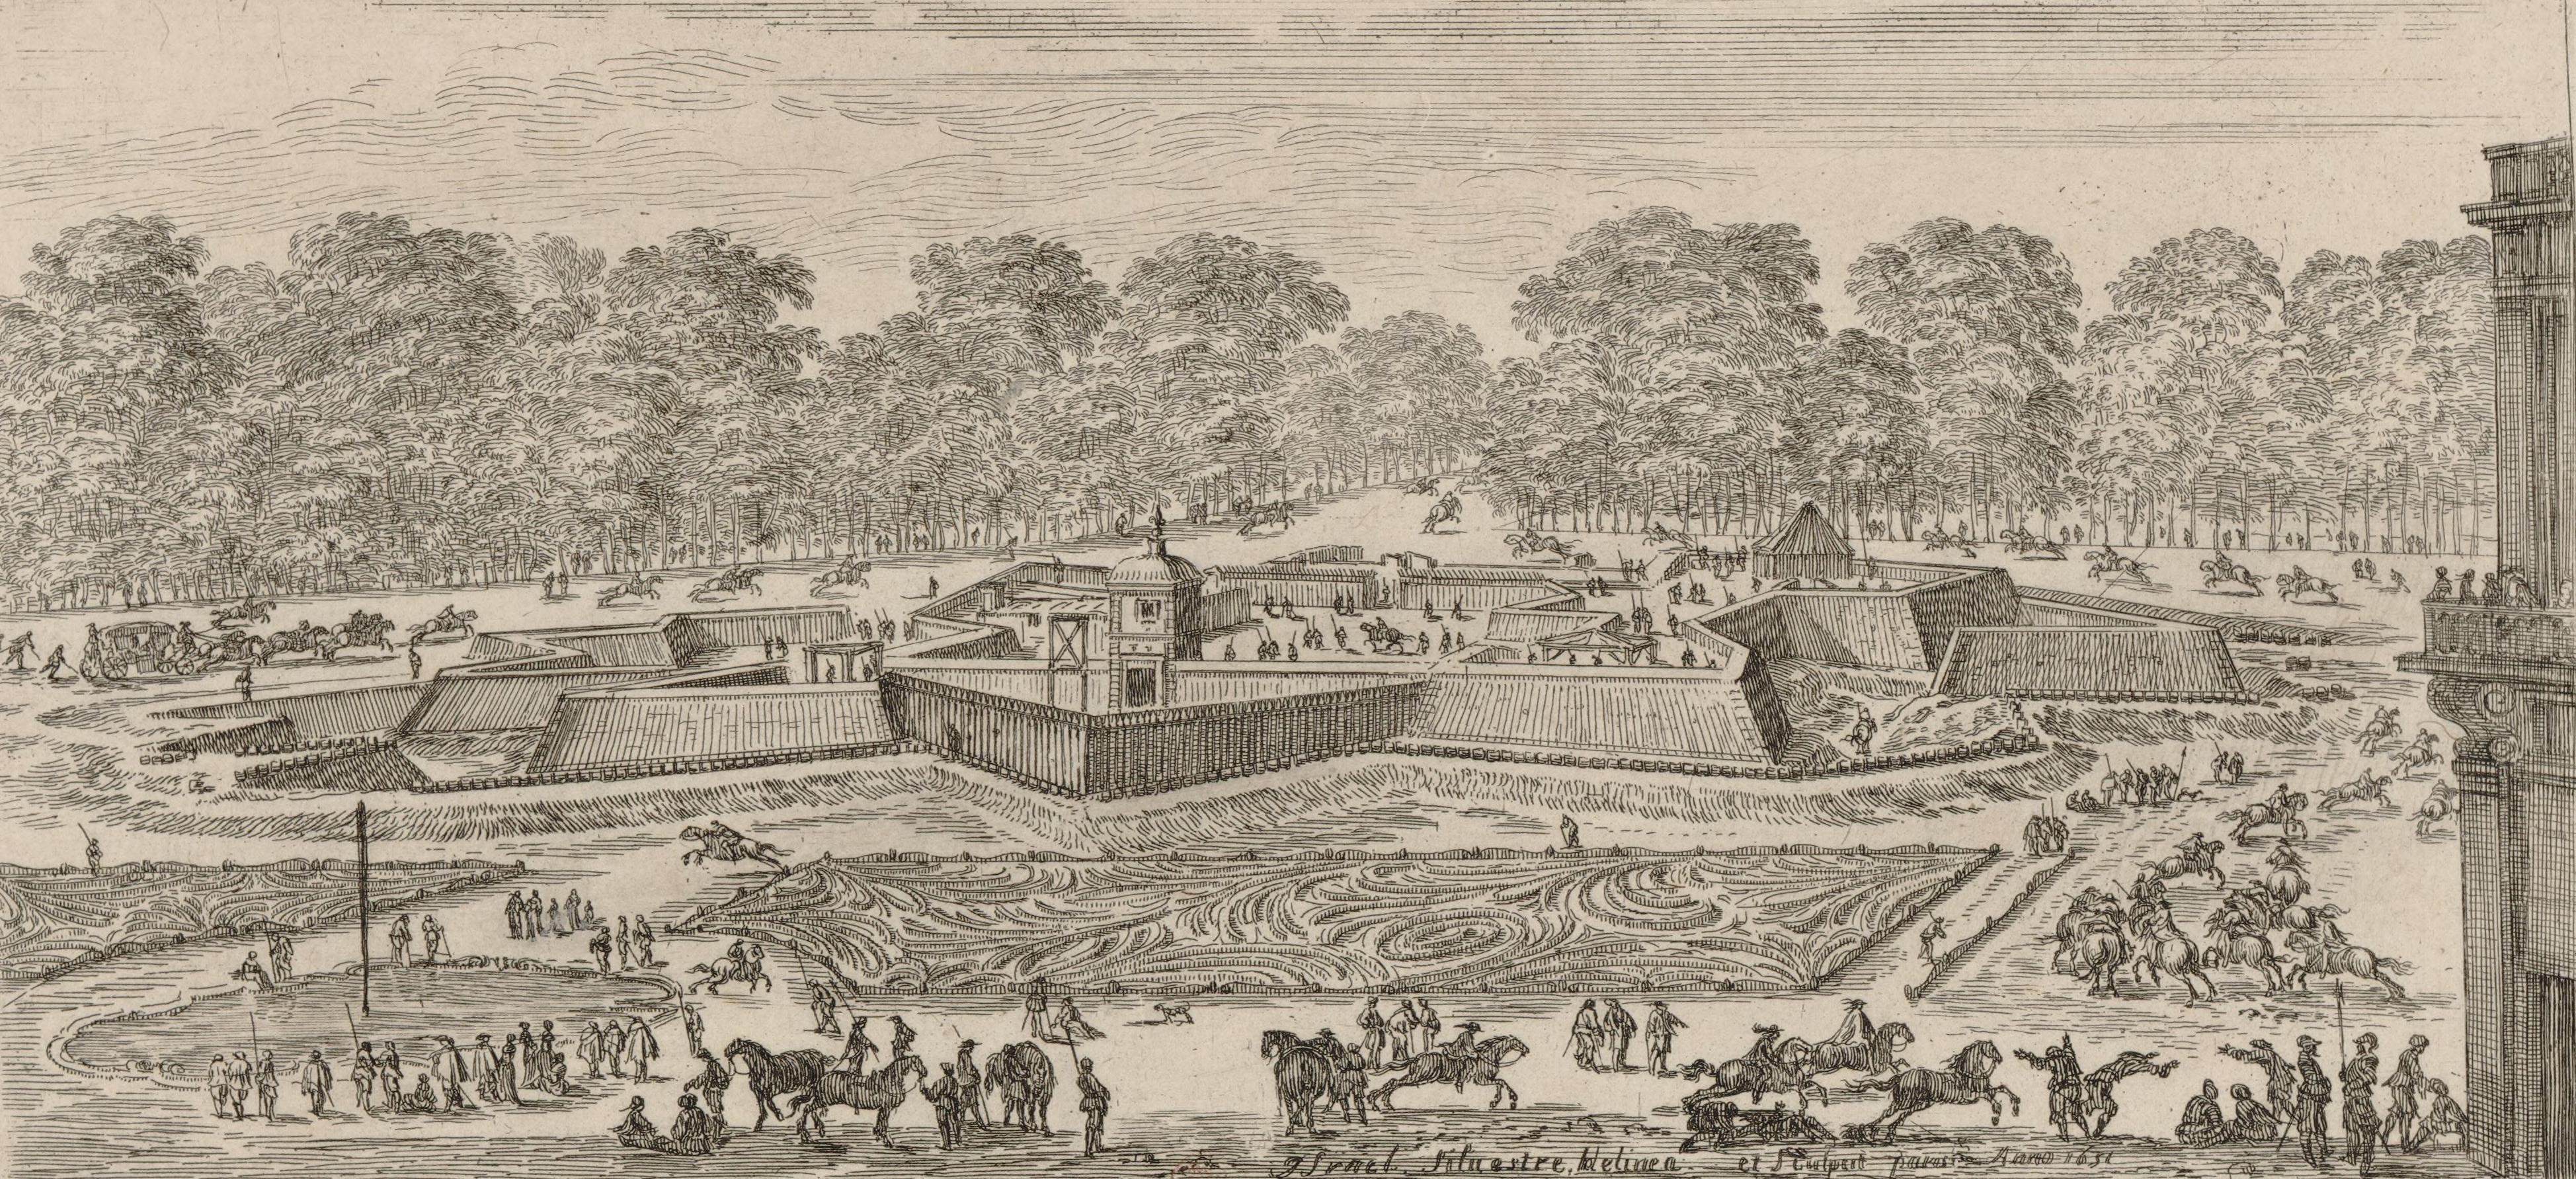 File:Fort Royal 1651 Château cardinal.jpg